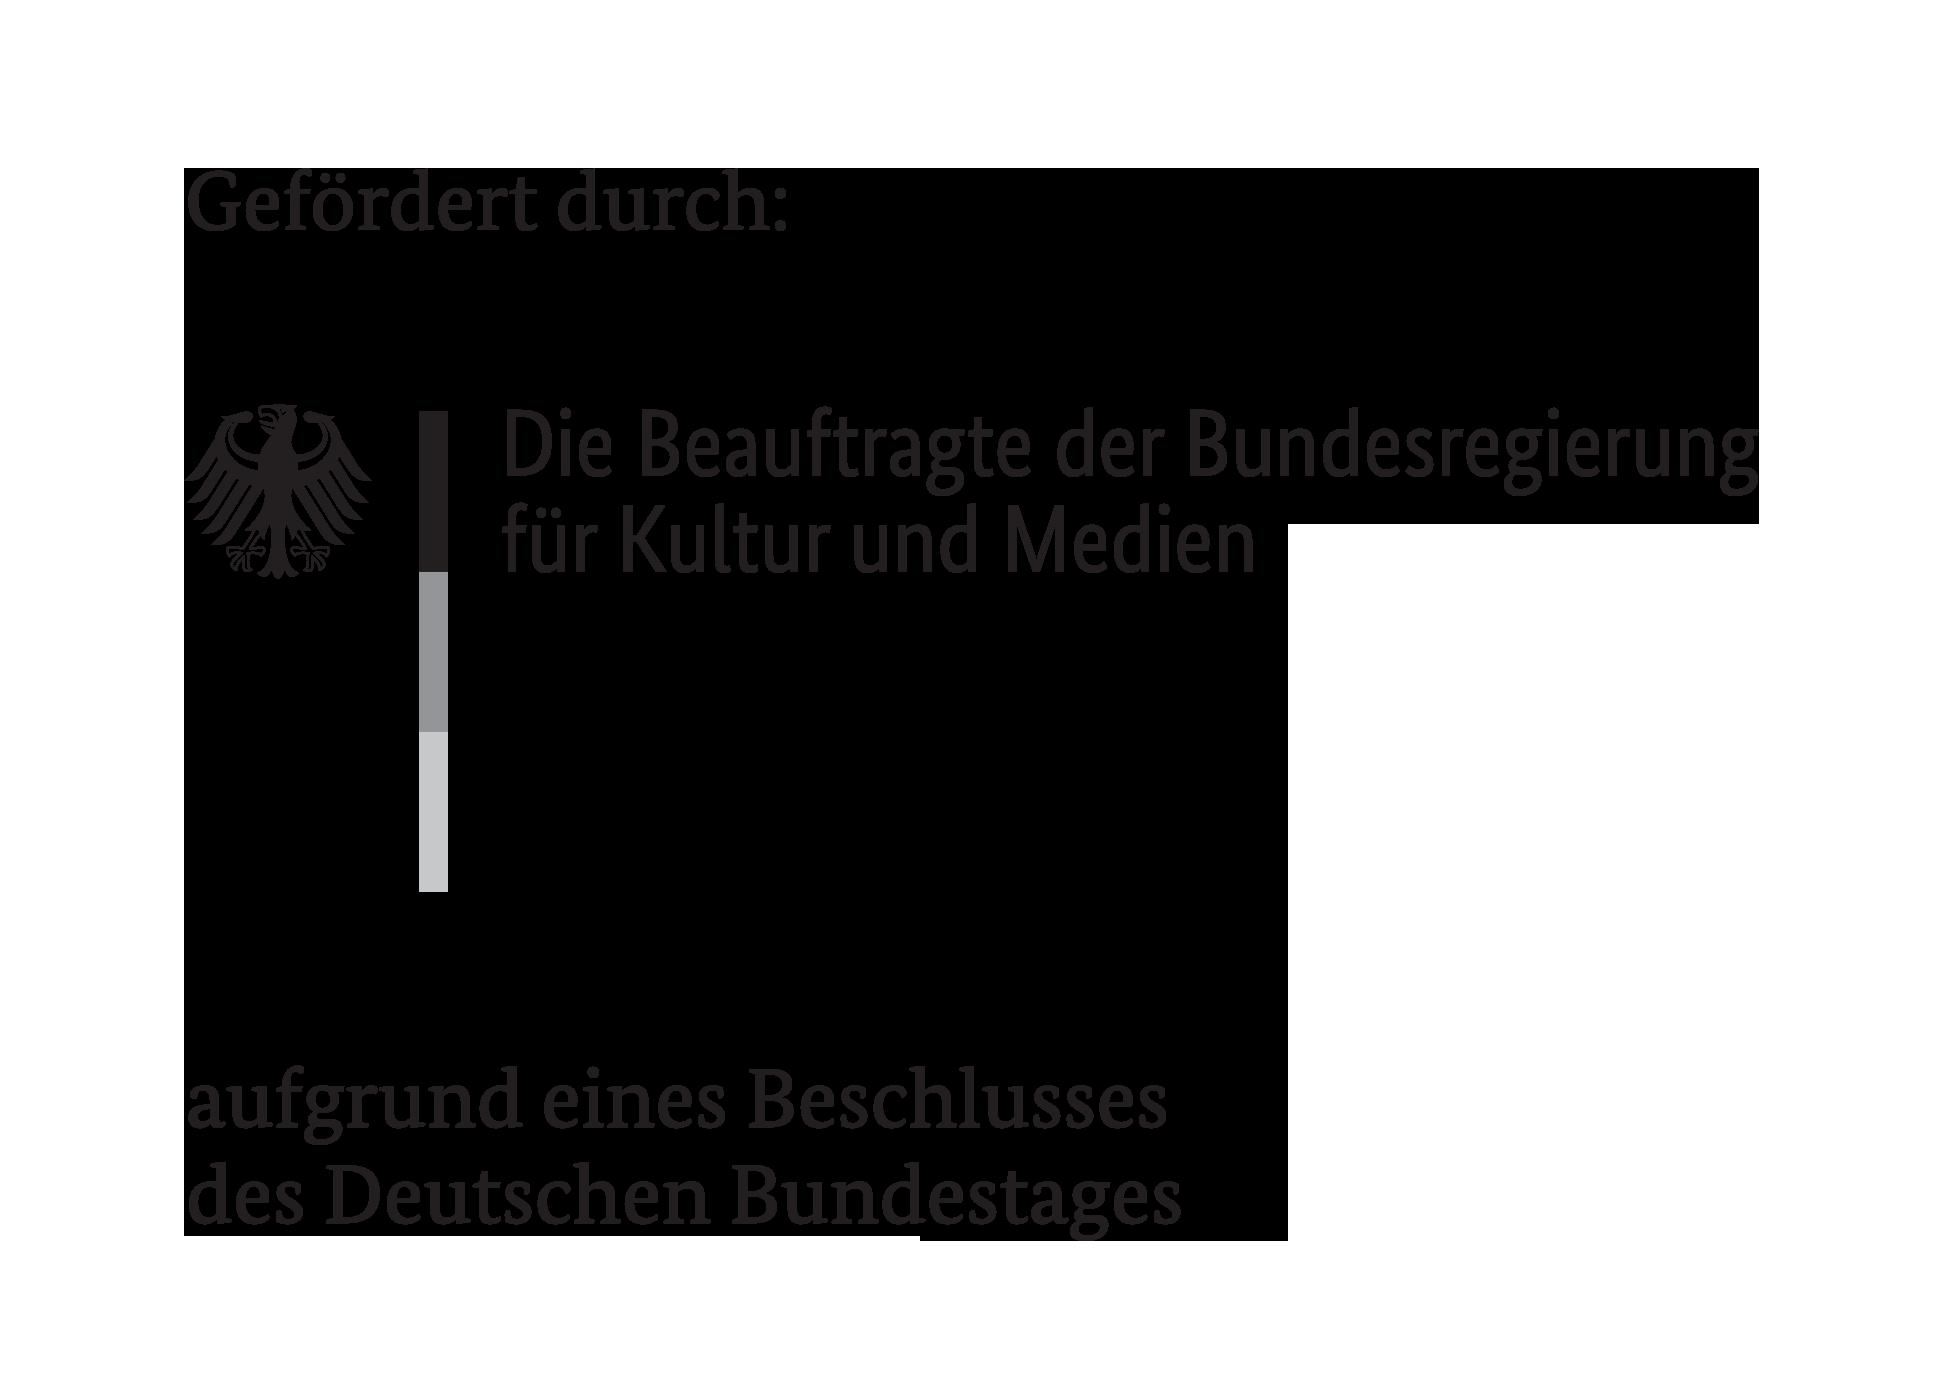 BKM_Fz_2017_Office_Grau_de.png